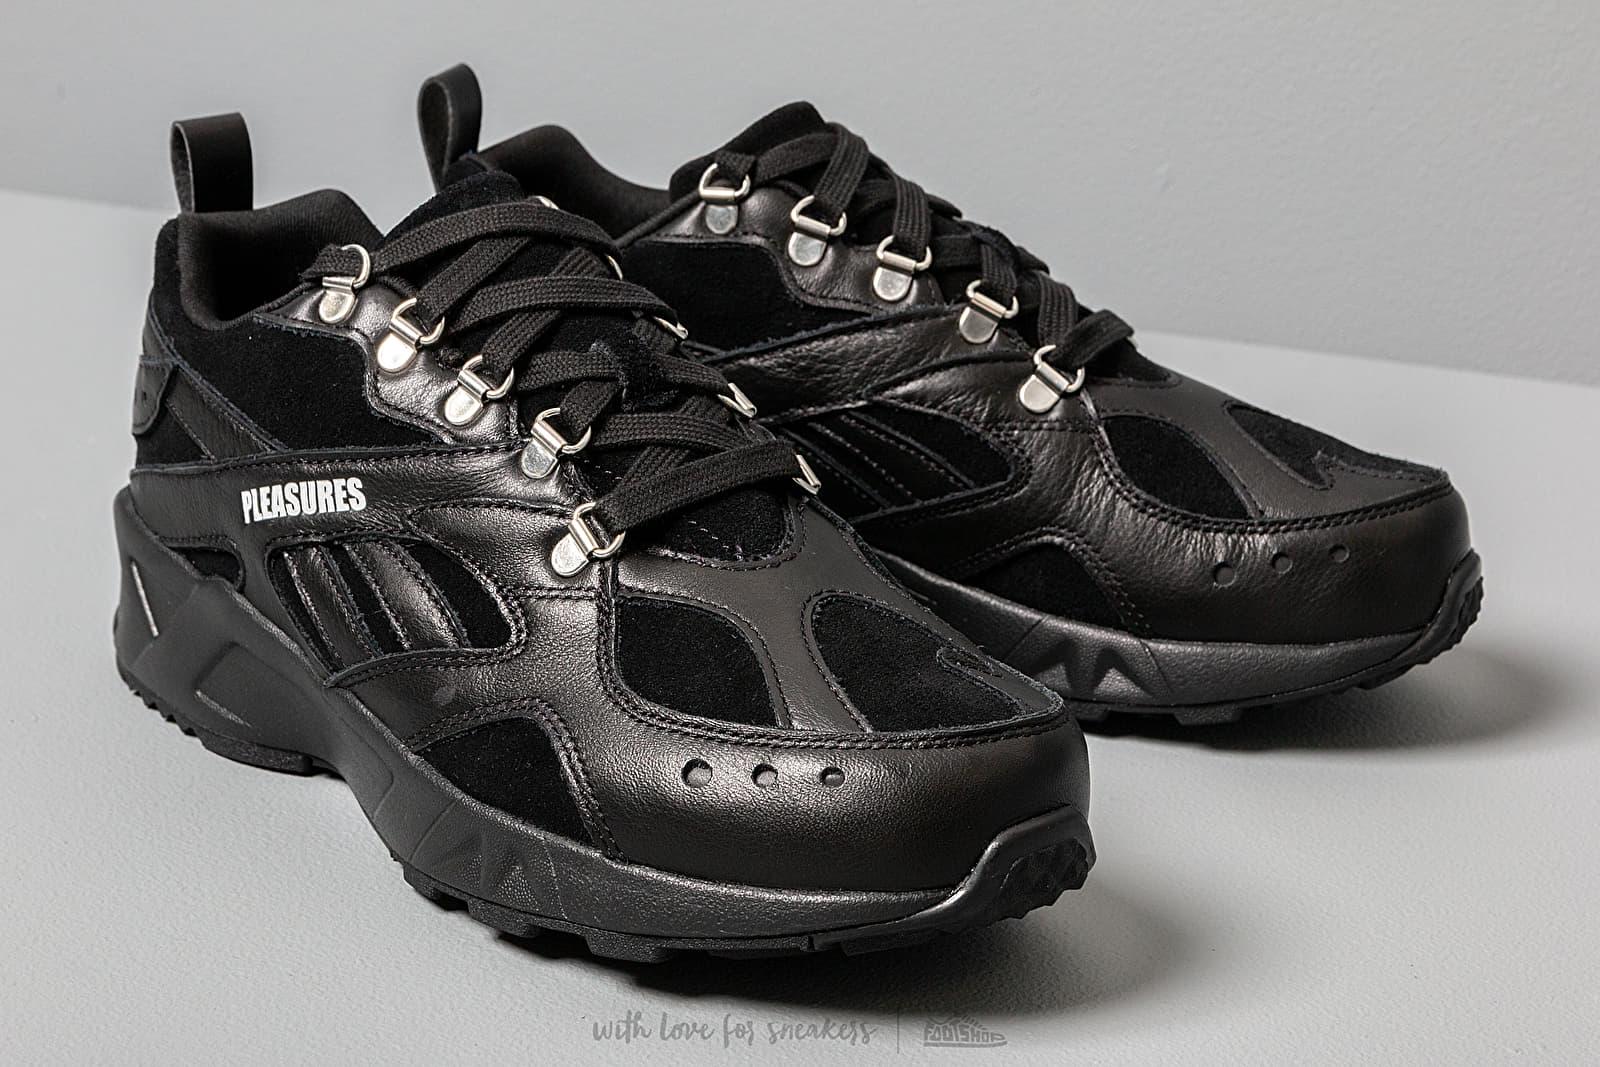 shoes Reebok x Pleasures Aztrek Black